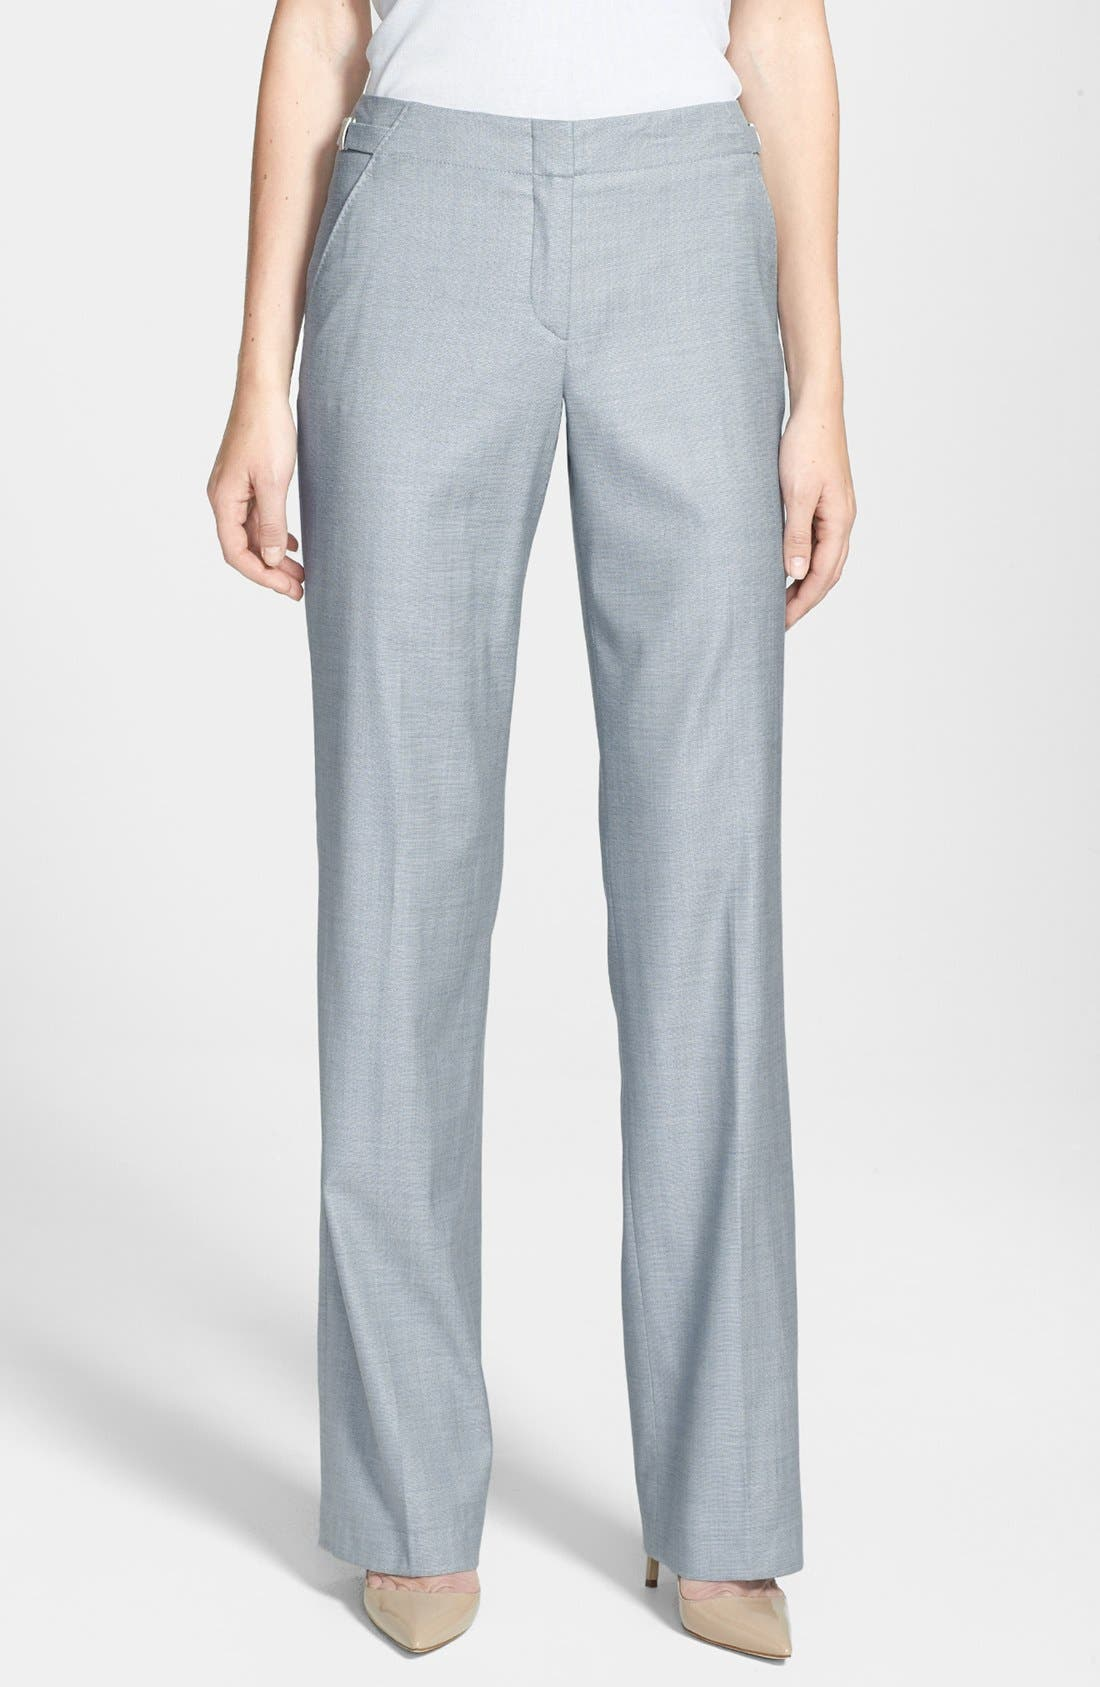 Main Image - BOSS HUGO BOSS 'Tillina' Stretch Wool Blend Trousers